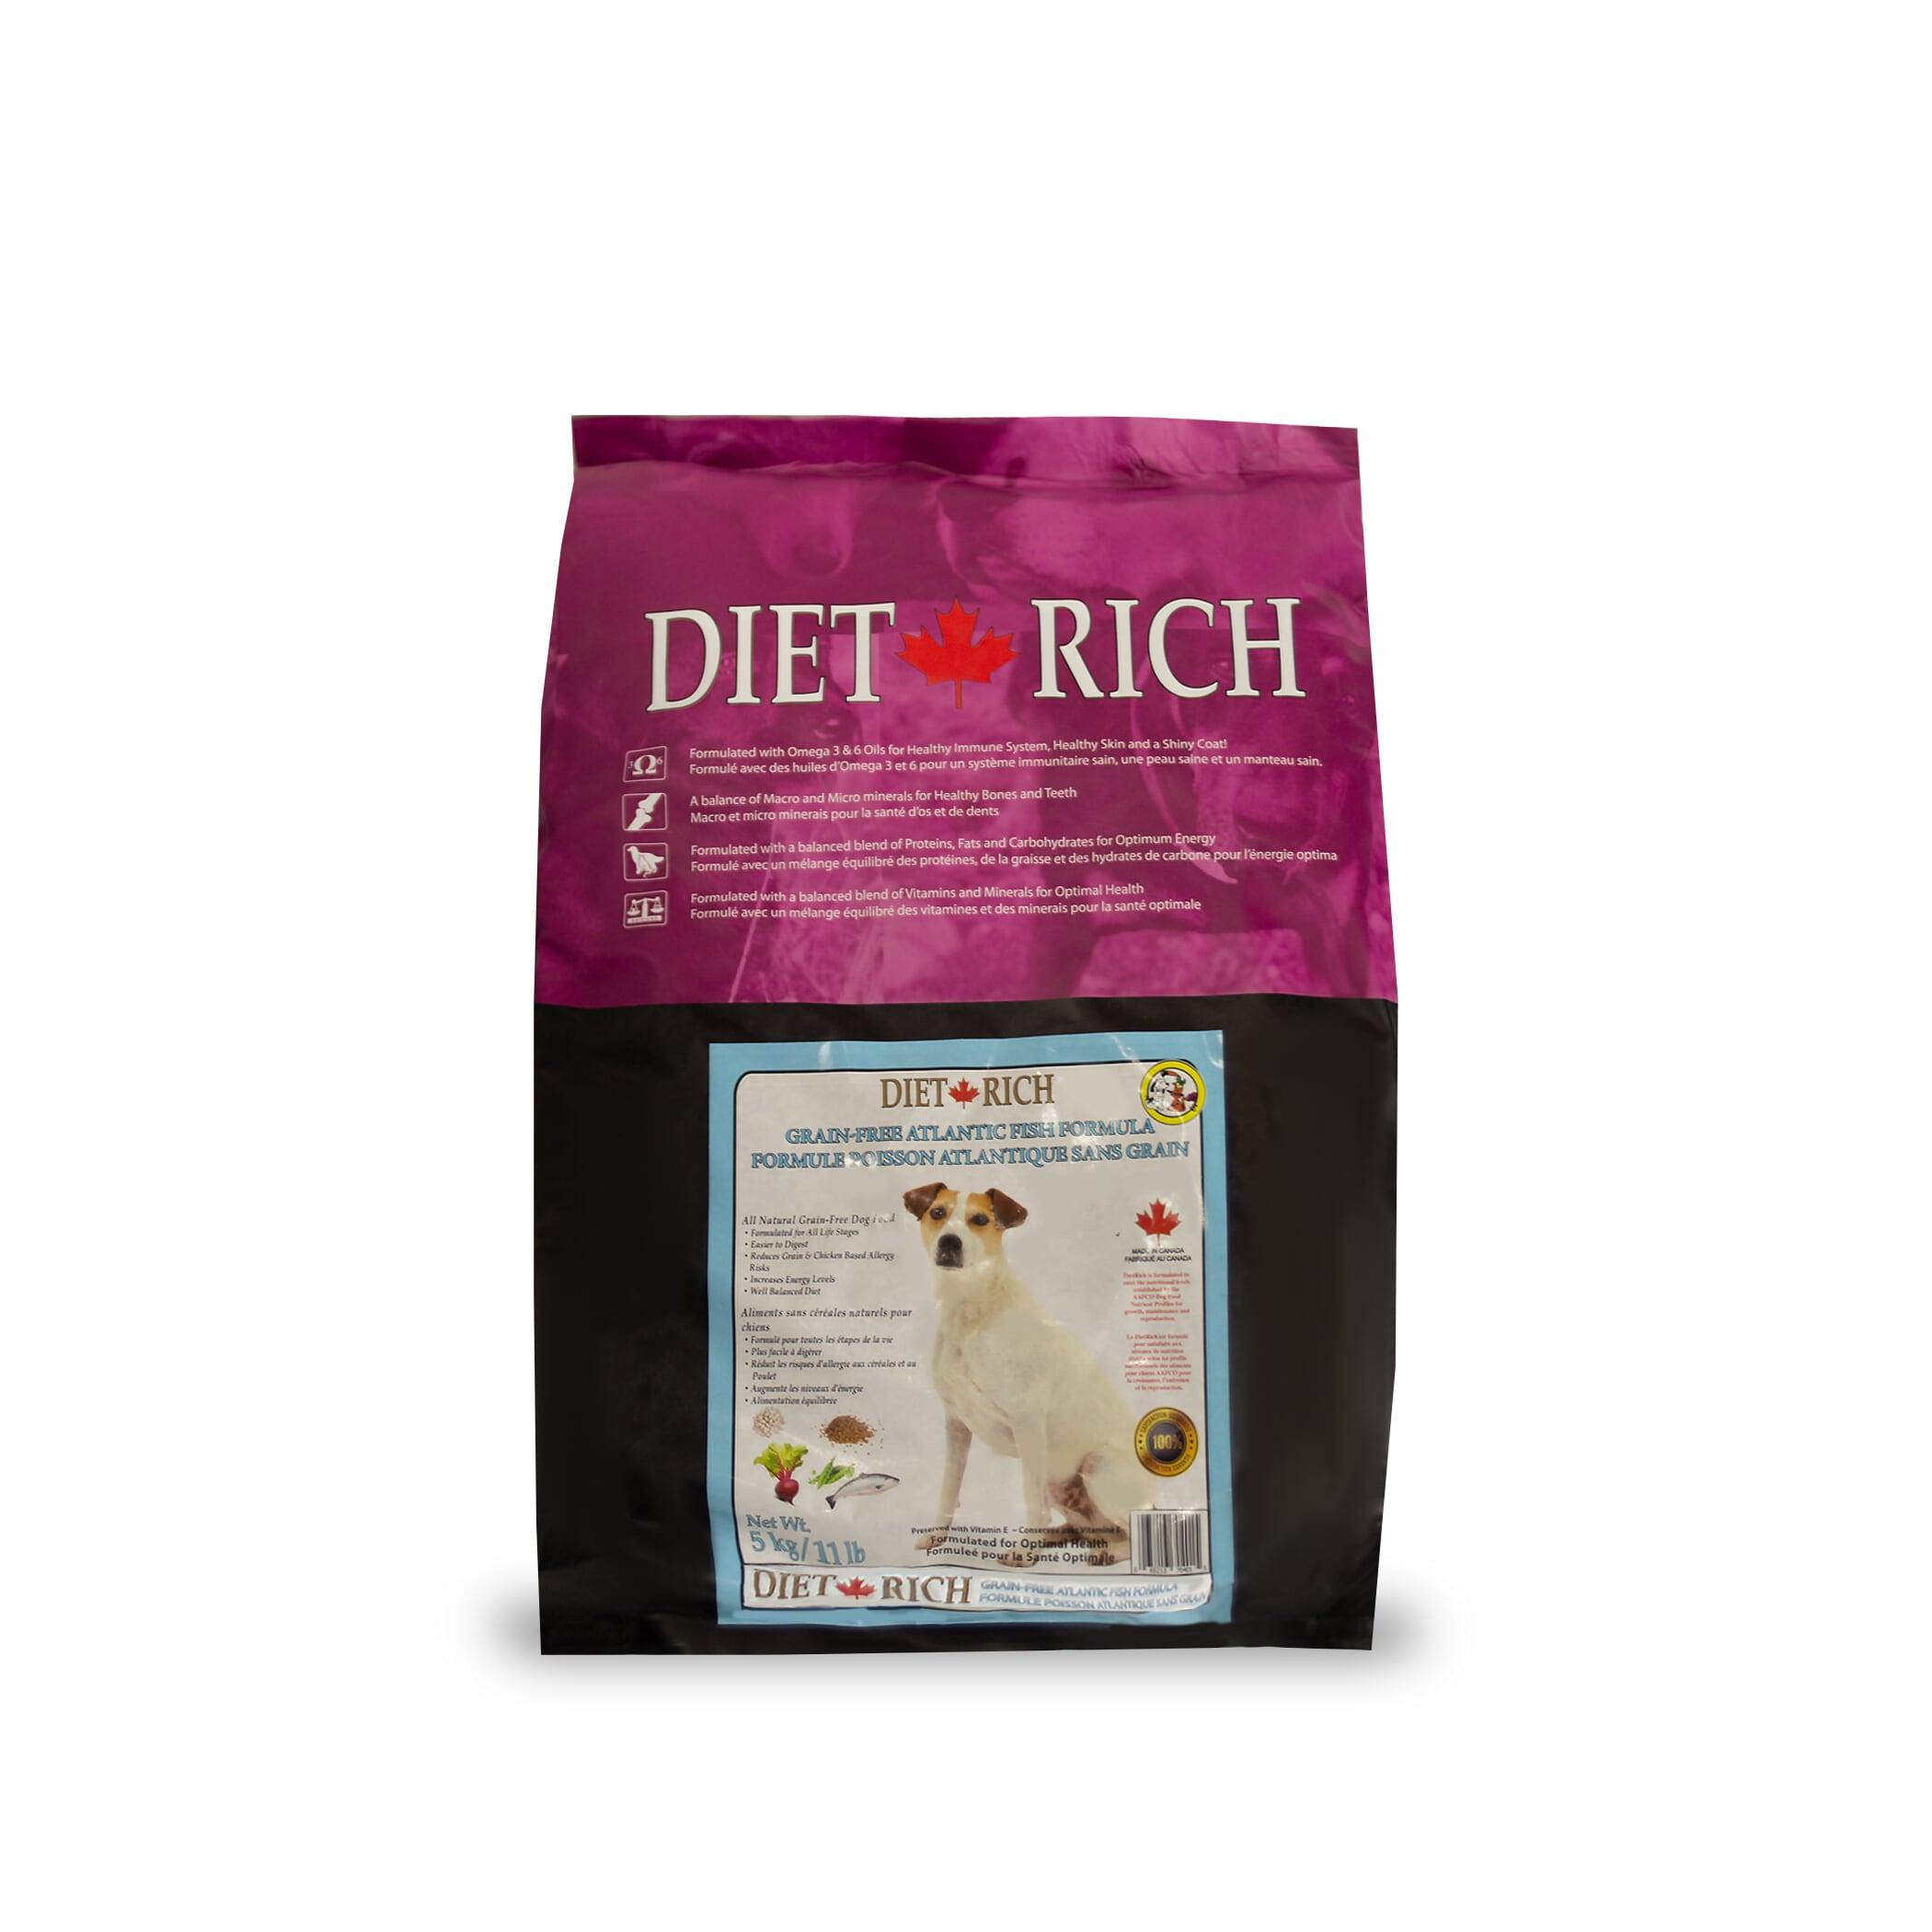 Dietrich Atlantic Fish Grain-Free Dry Dog Food, 5-kg